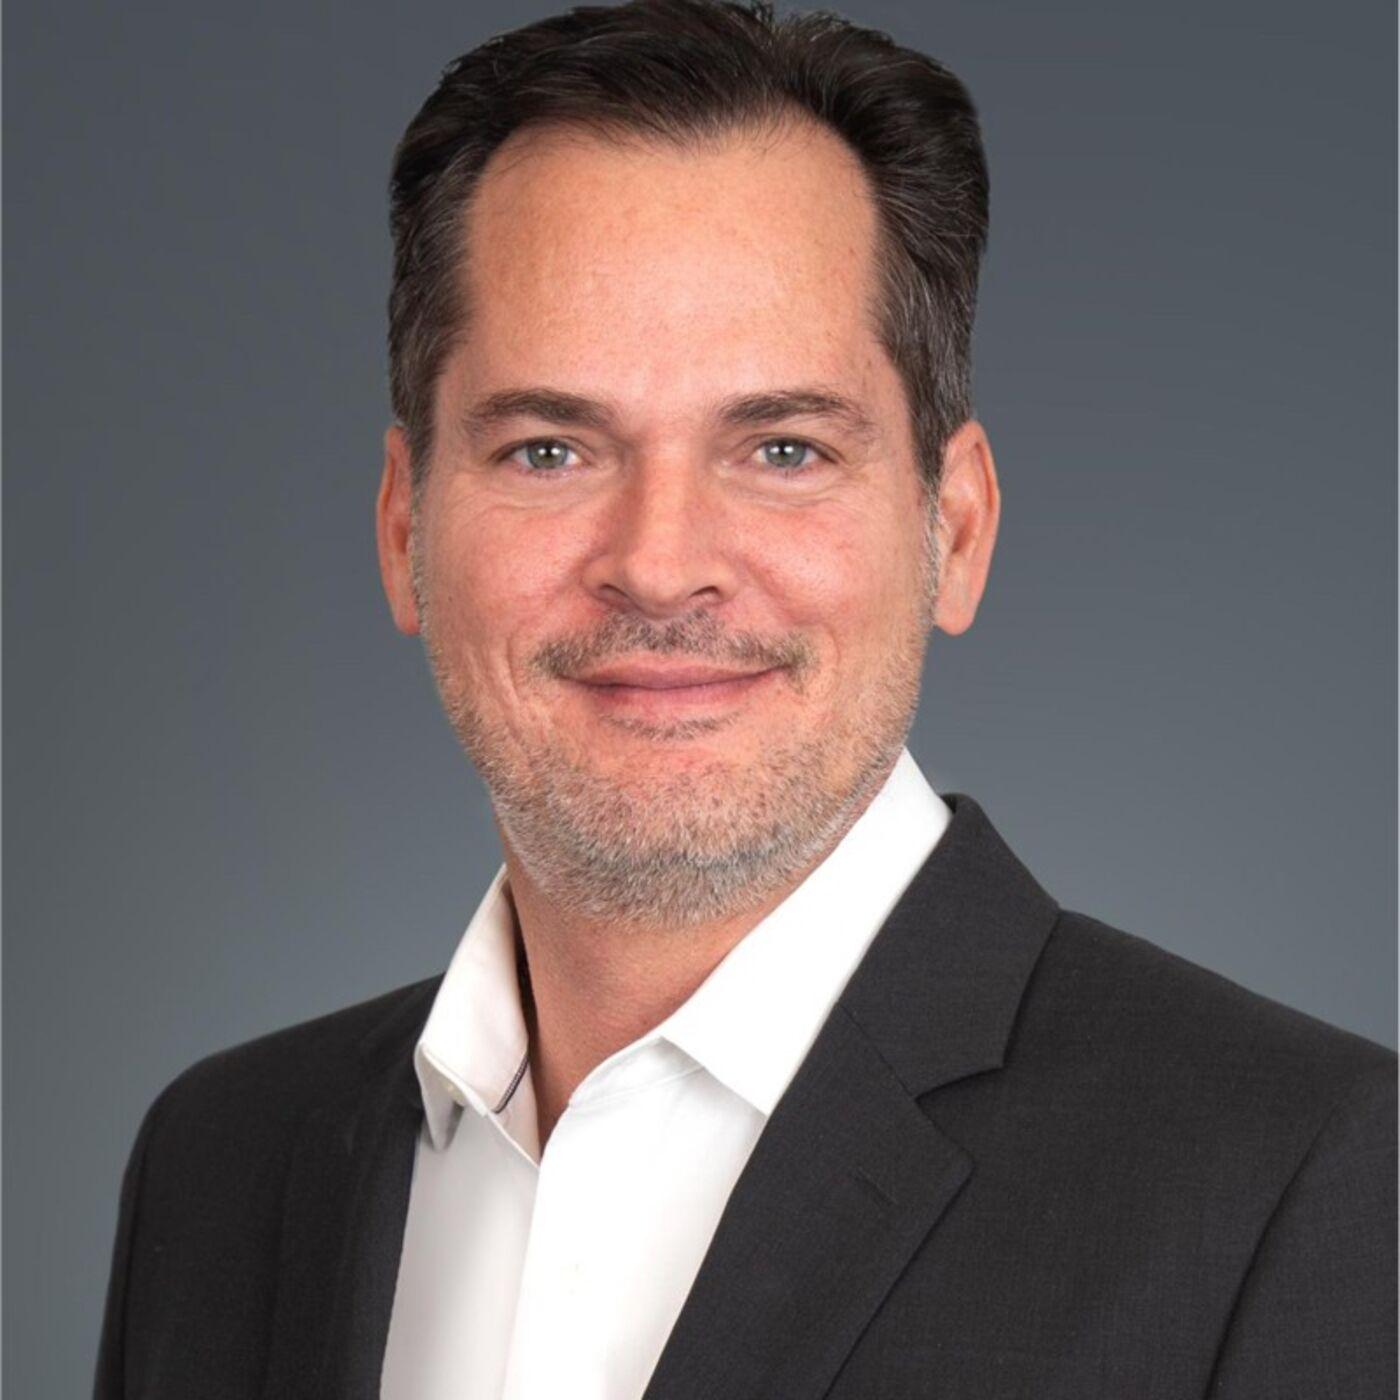 #08: Luis Felipe Masroua, VP Executive and COO of H.J. Baker & Bros.